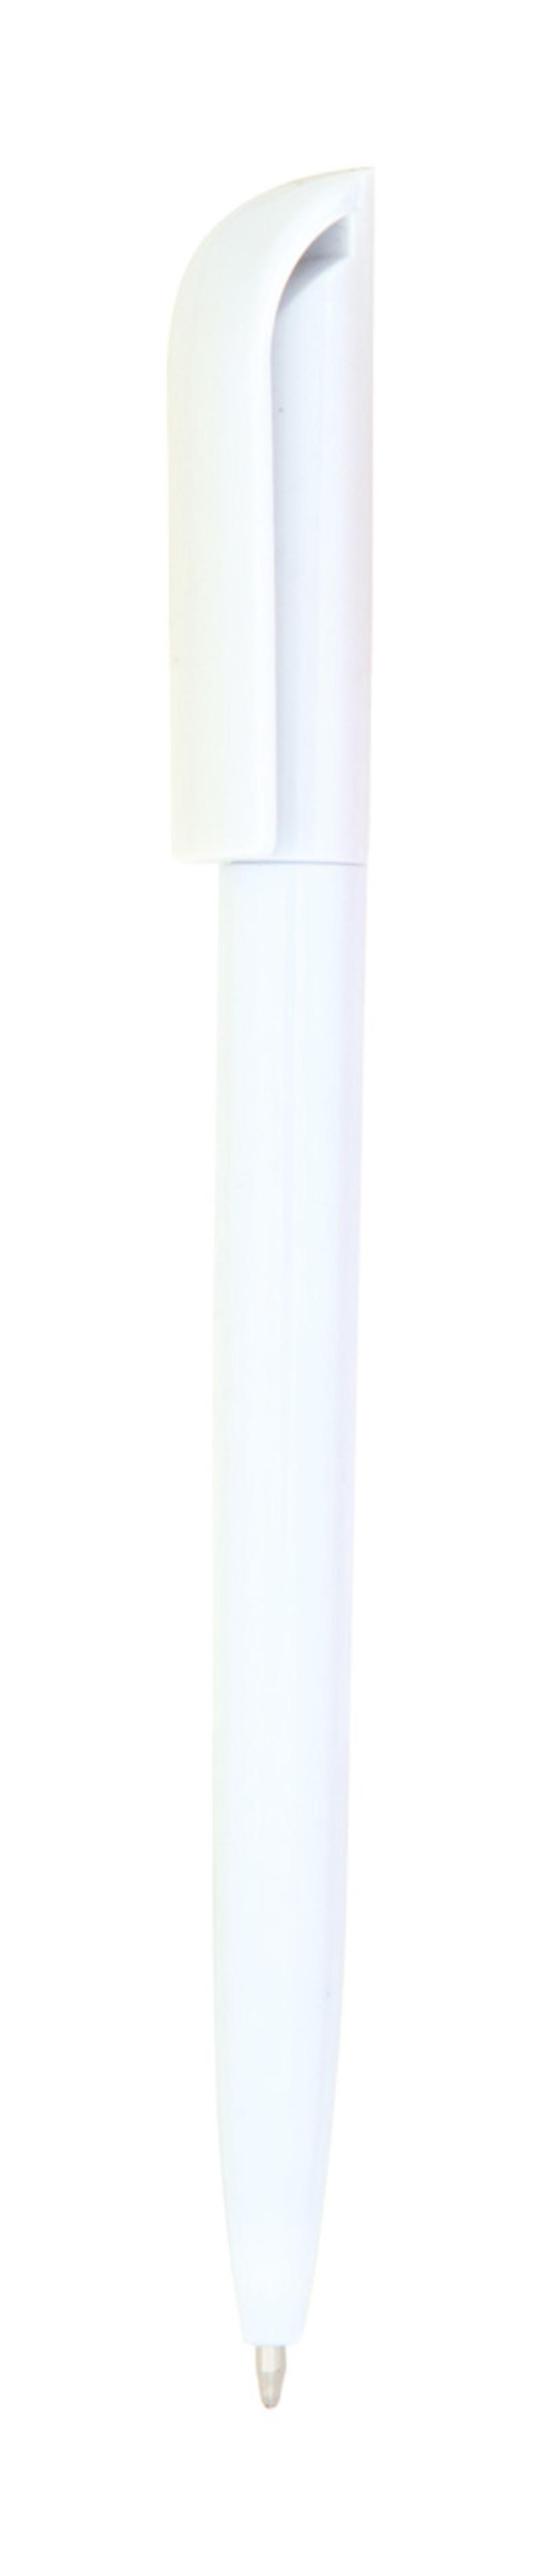 Morek pen